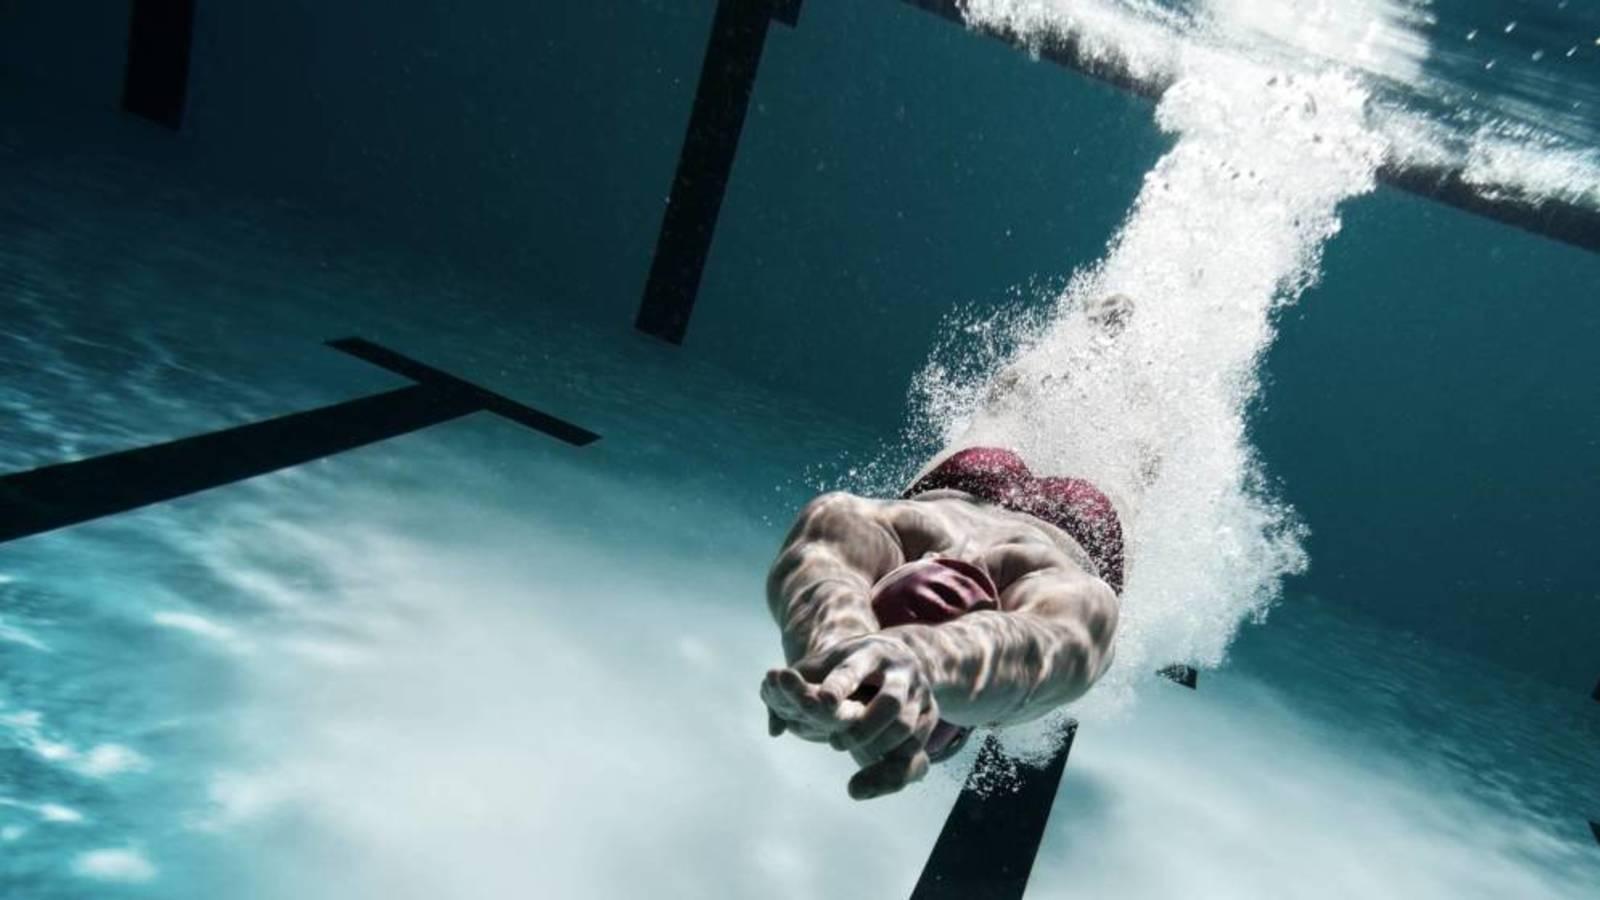 Entrenamiento-de-natación-para-adelgazar-3